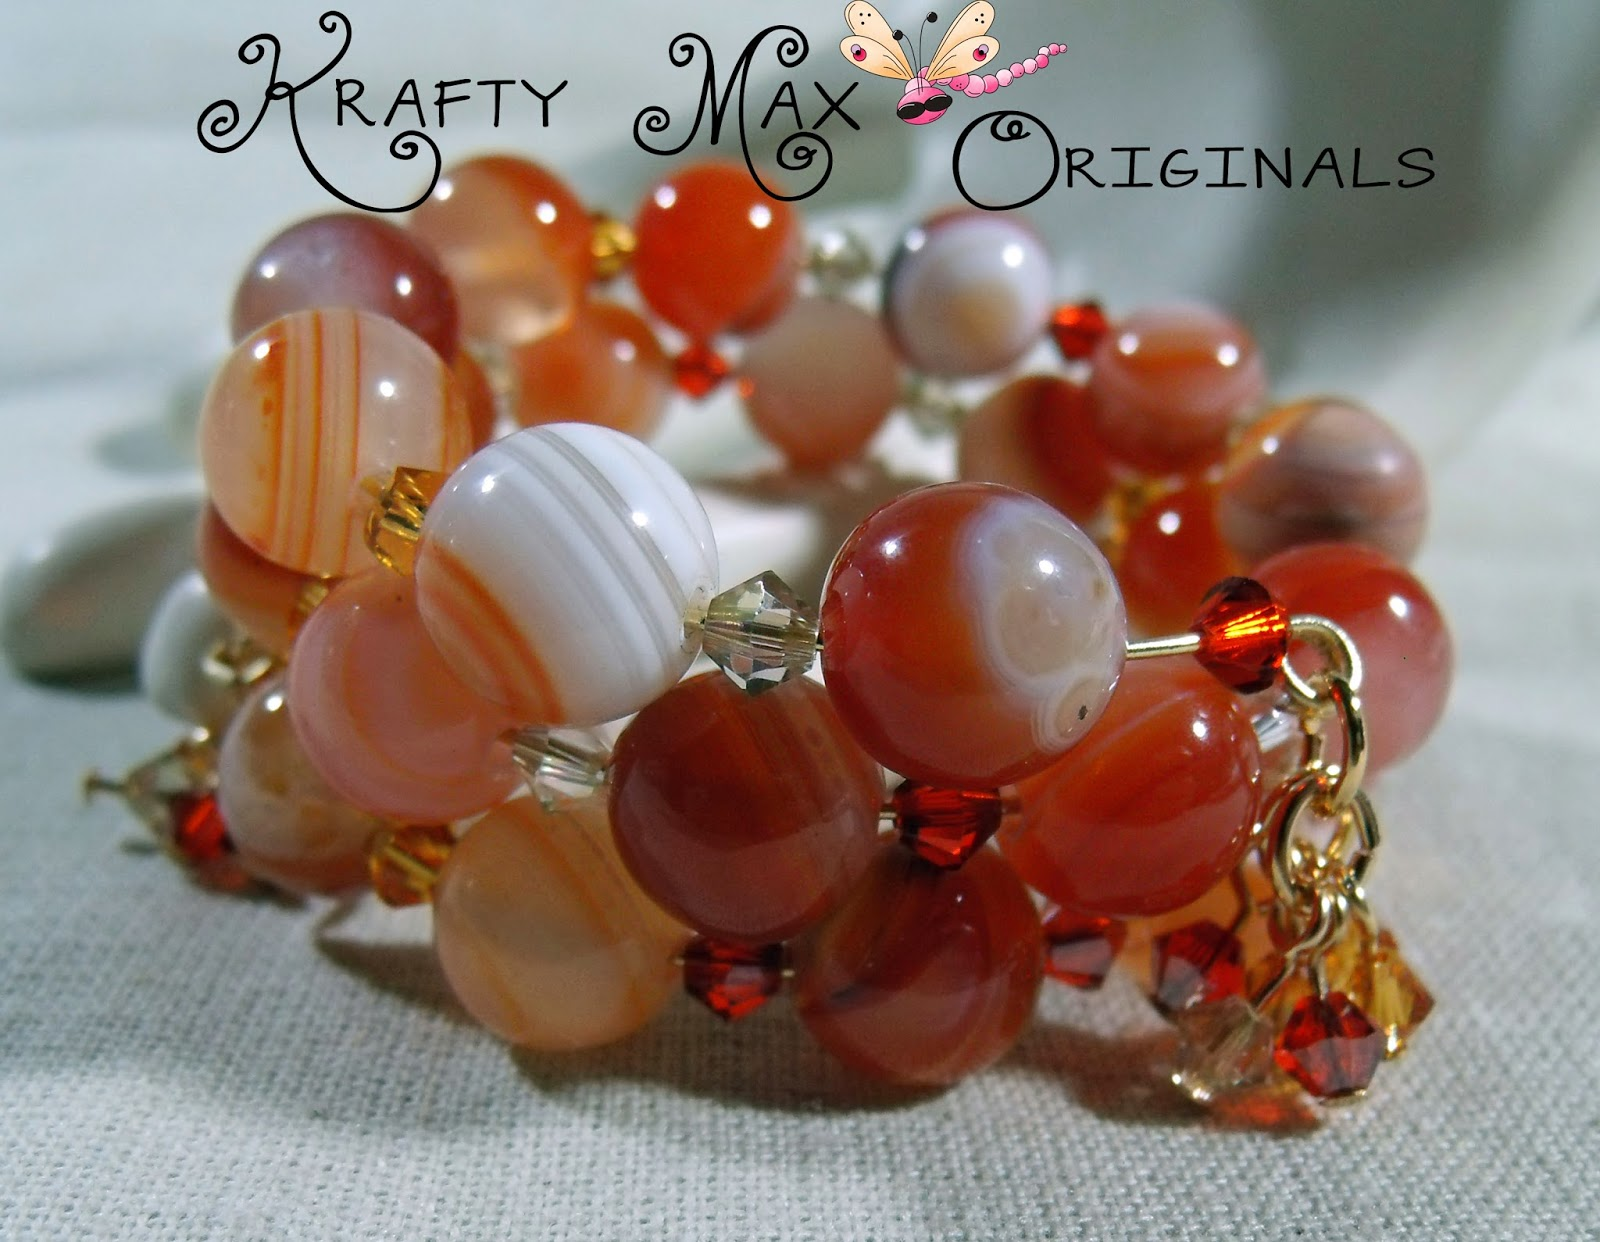 http://www.artfire.com/ext/shop/product_view/9380312